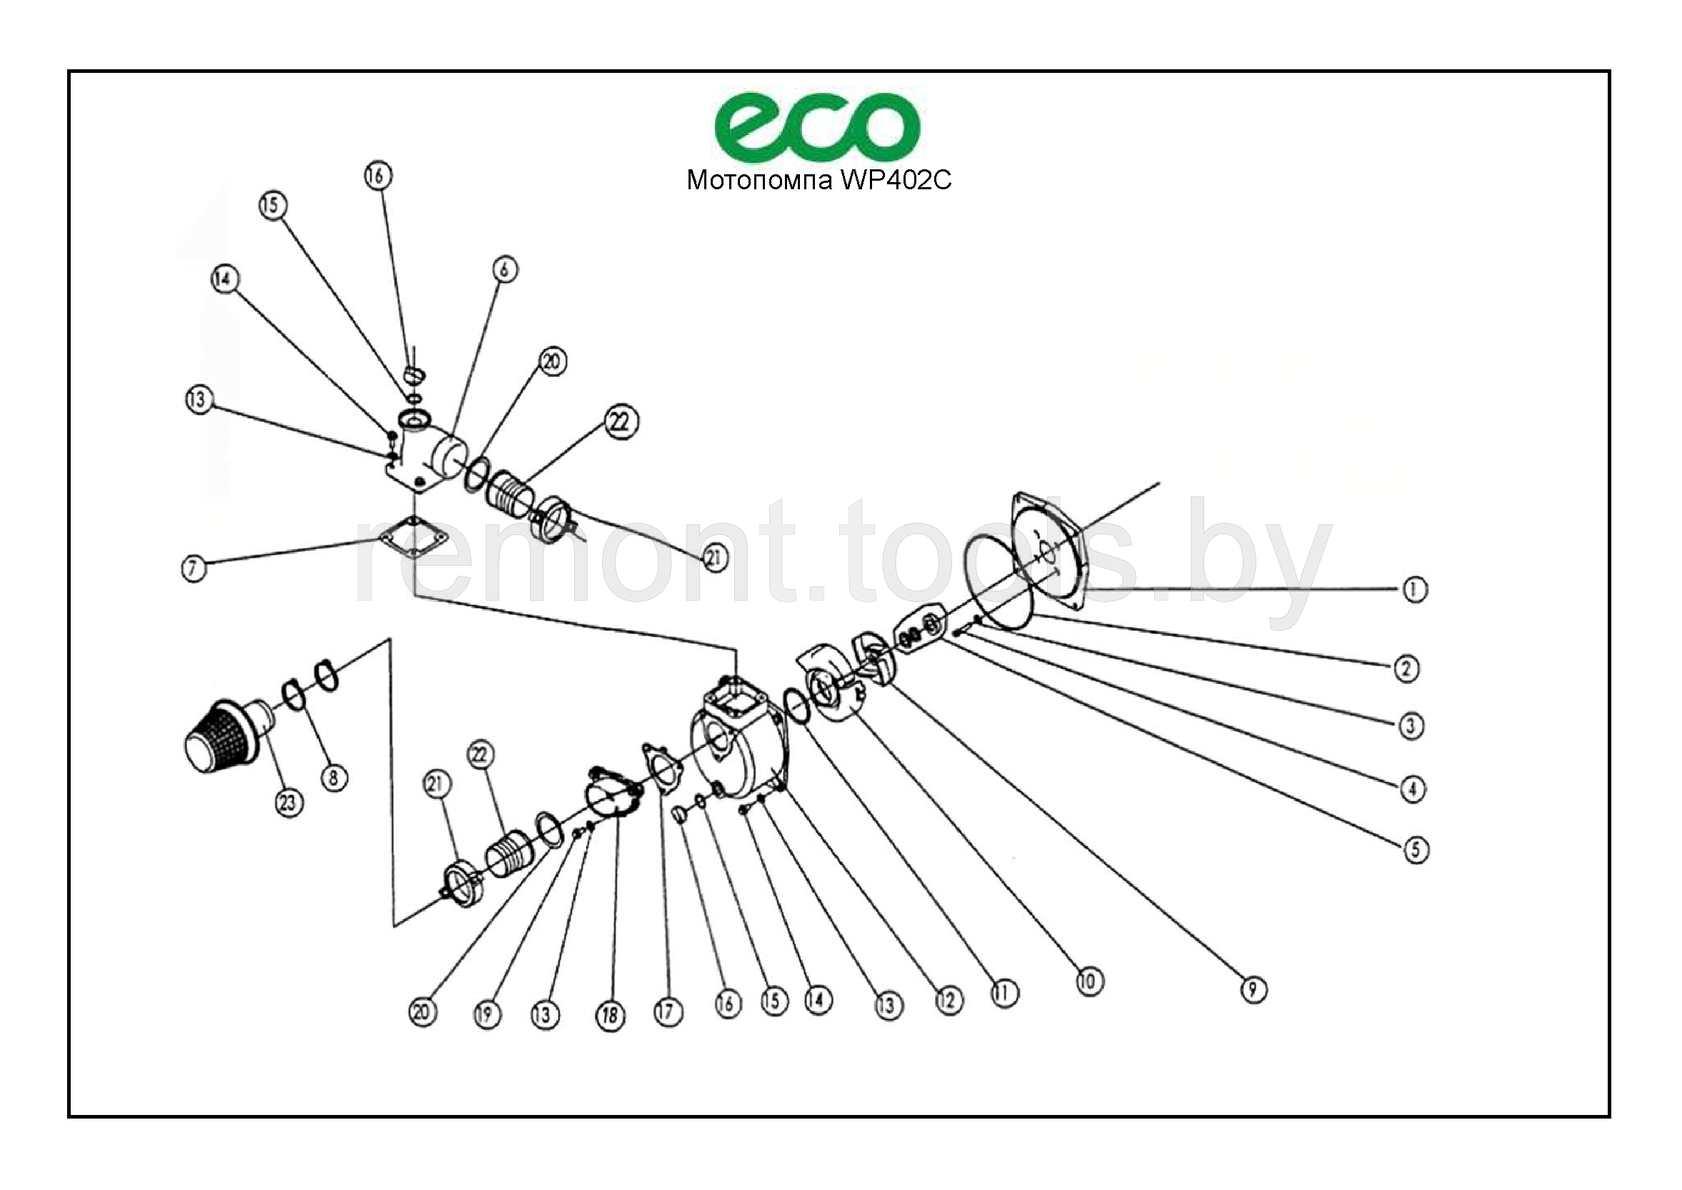 Eco Мотопомпа Wp402c